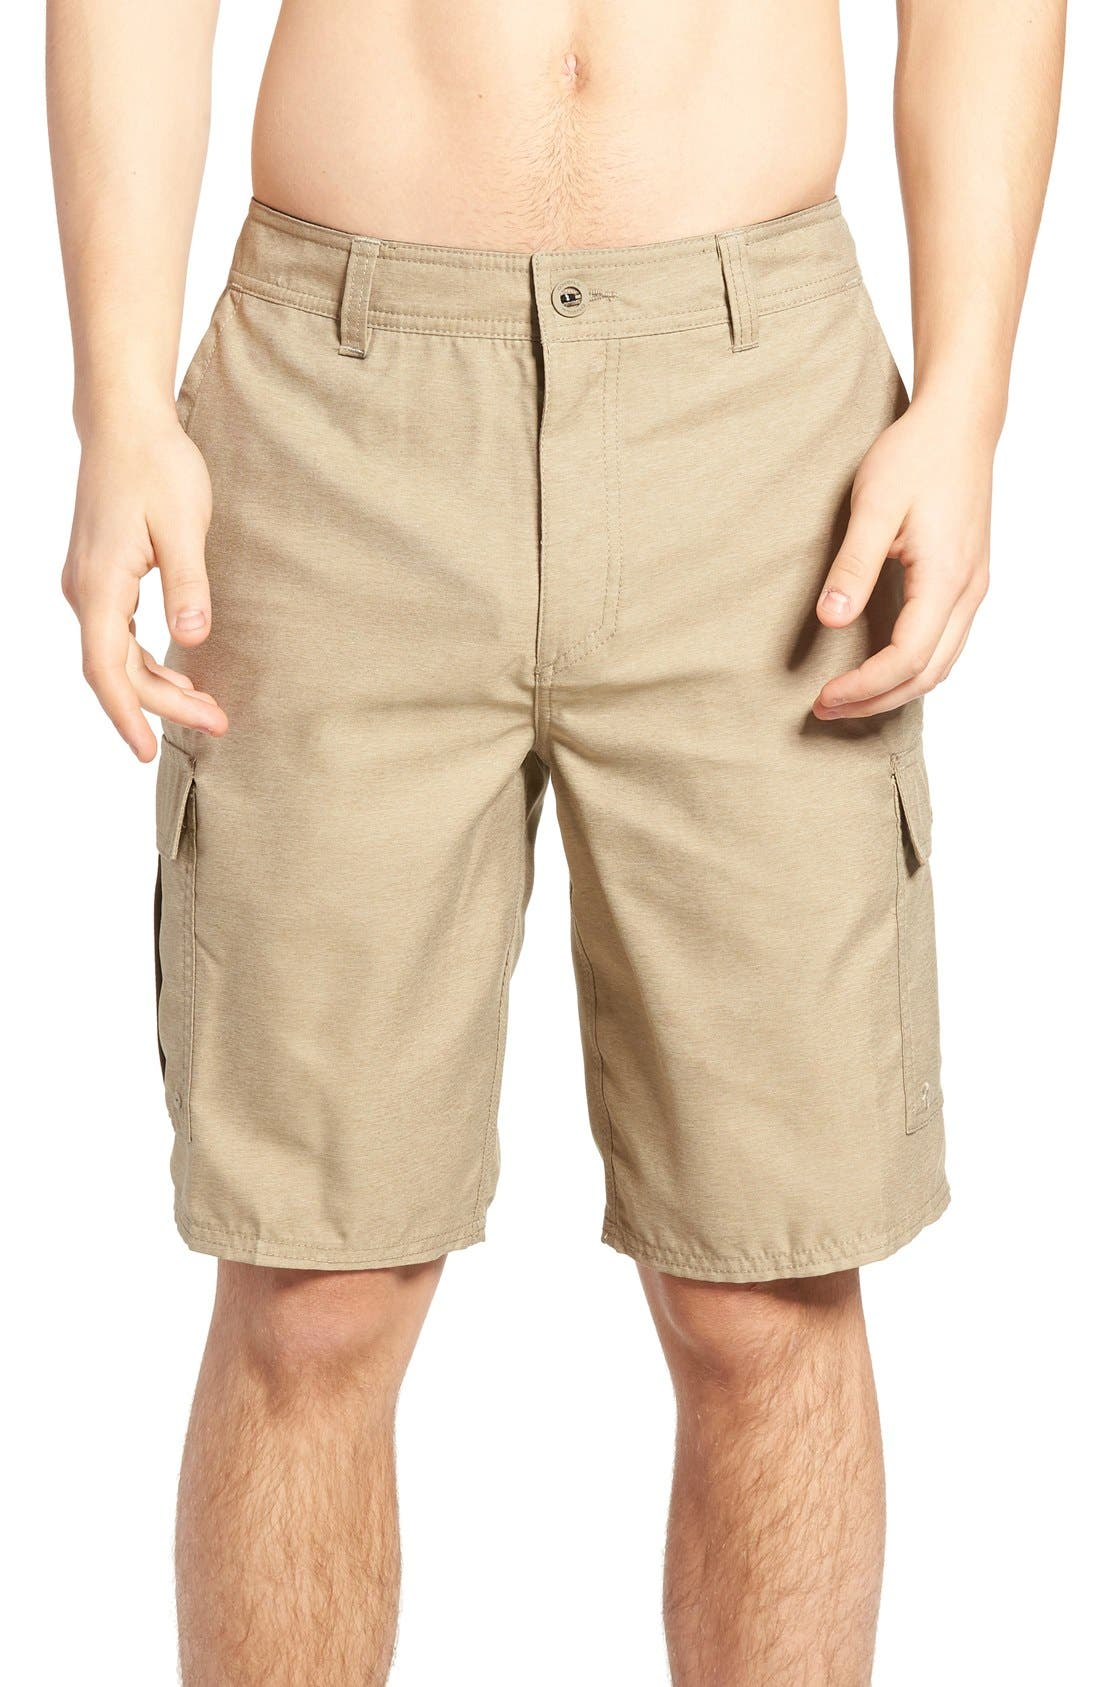 O'NEILL Ranger Hybrid Cargo Shorts